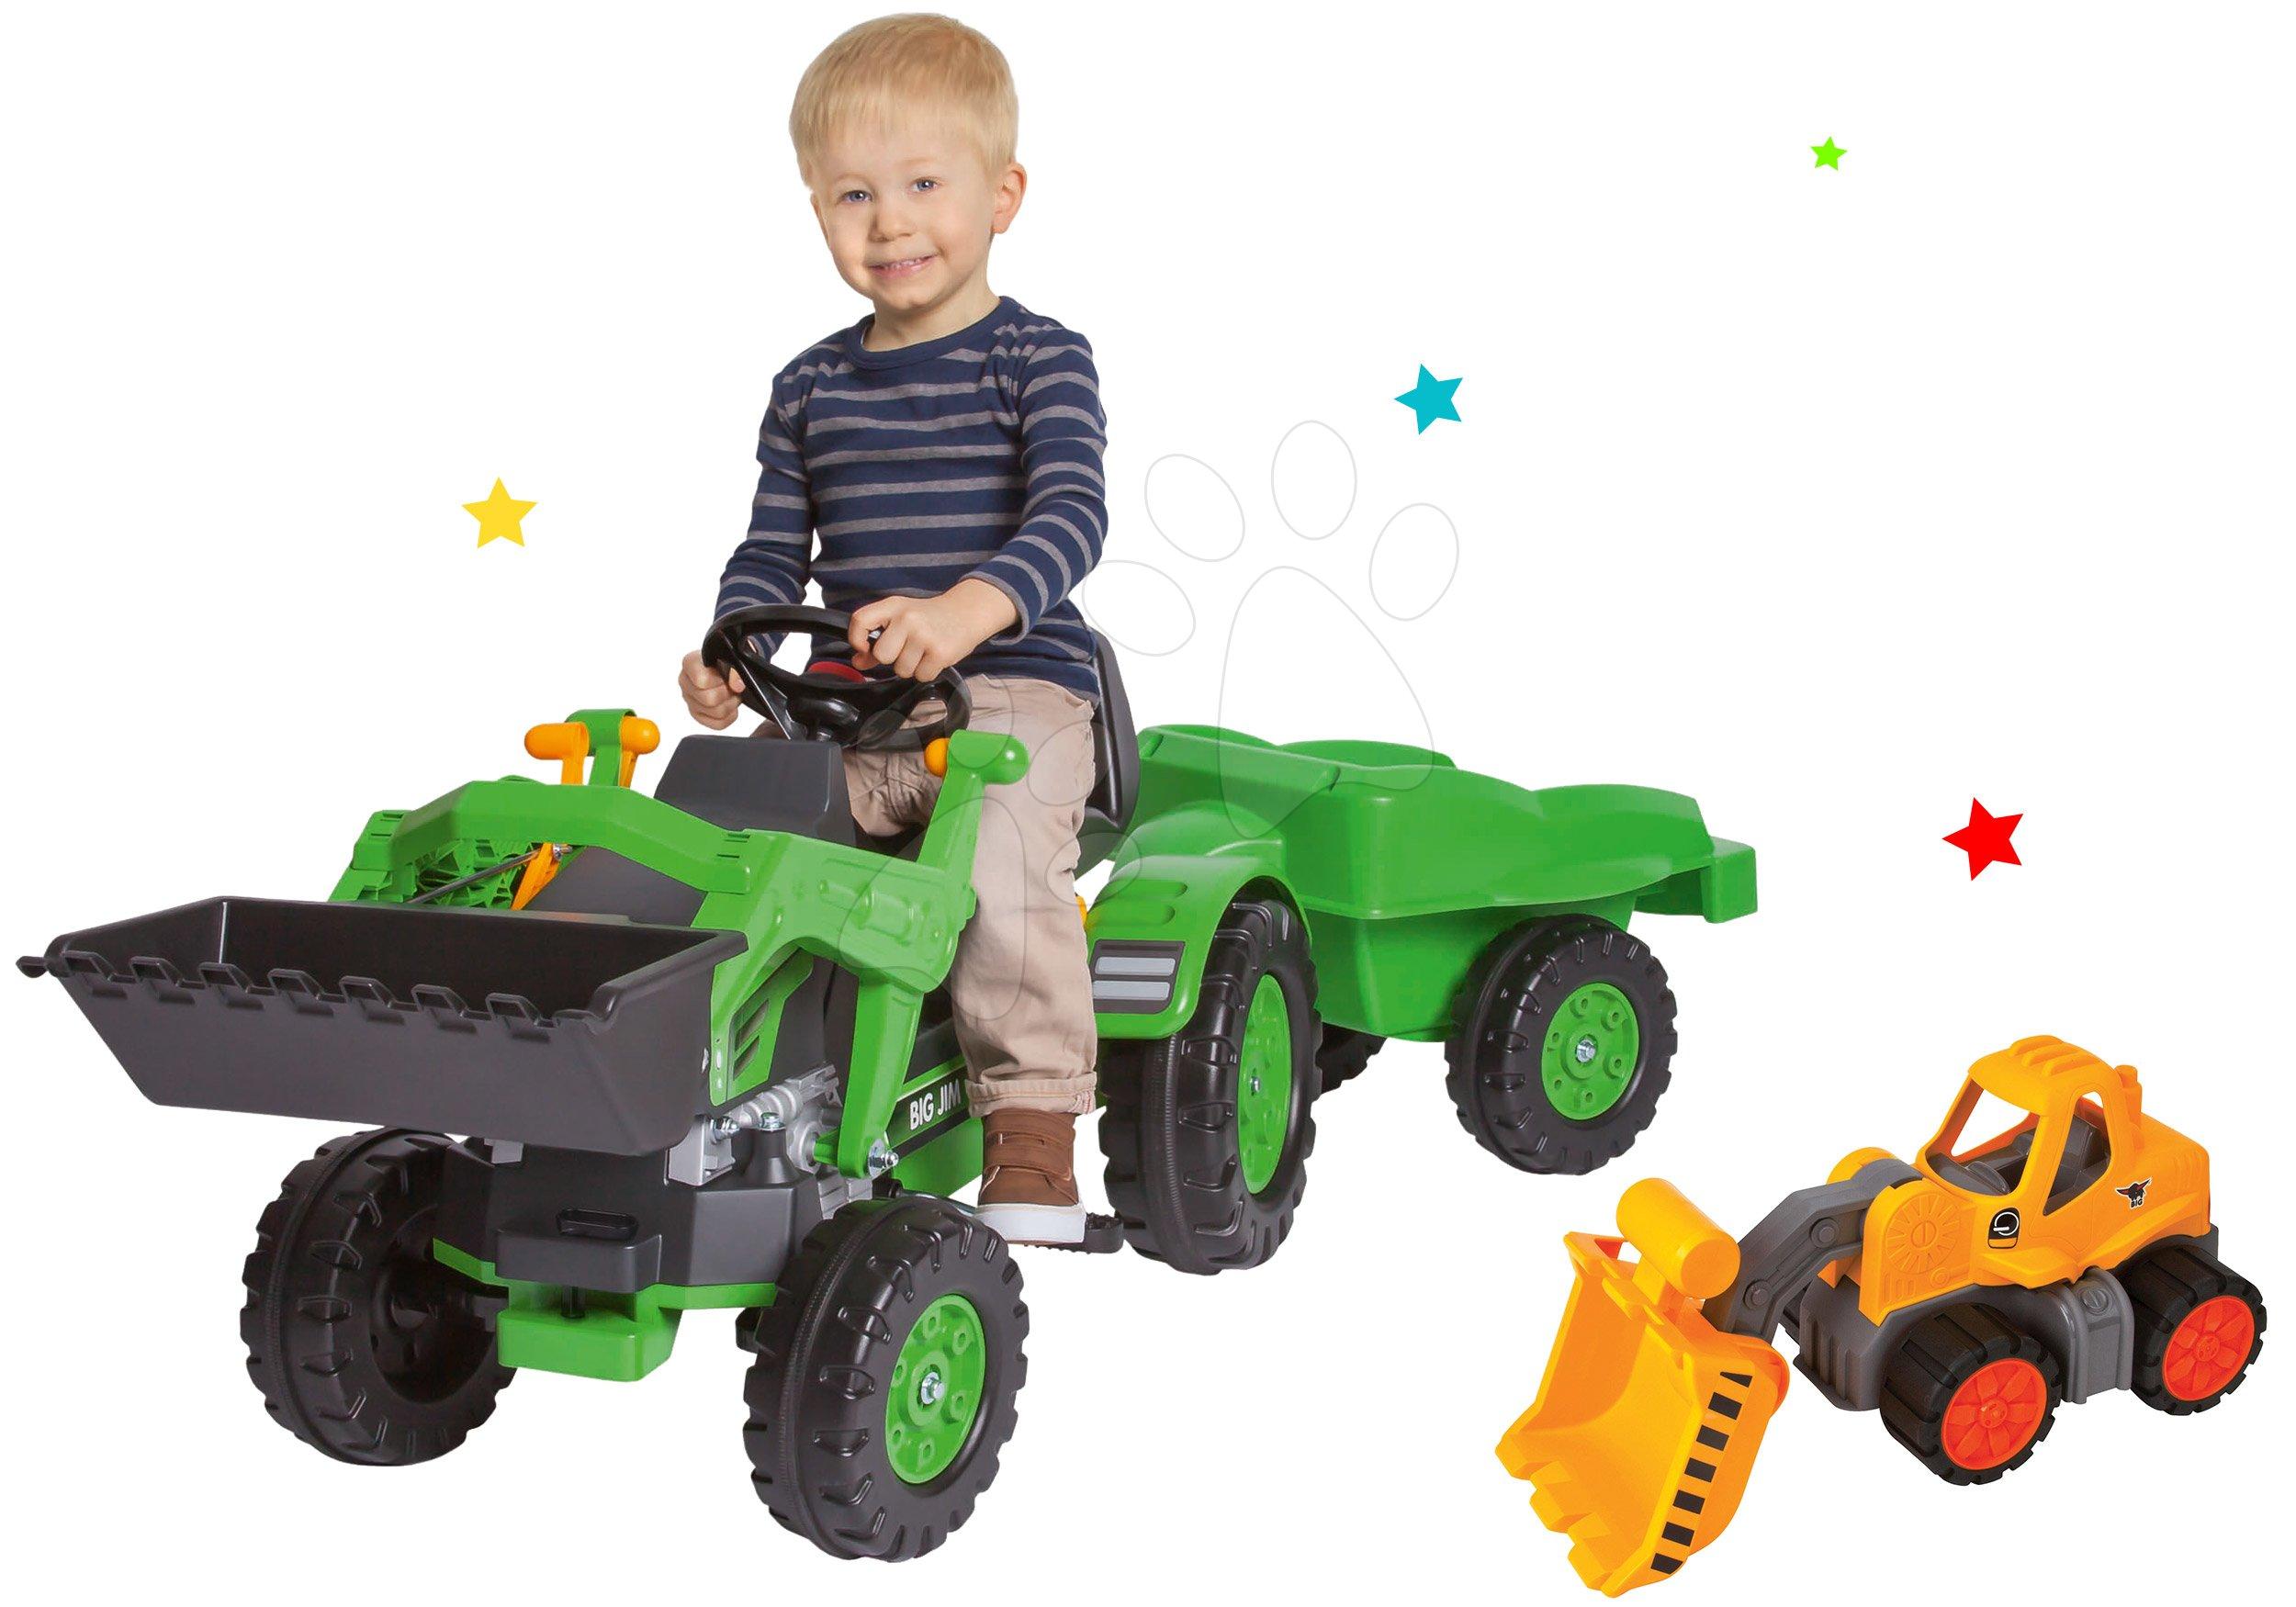 Set šliapací traktor Jim Loader BIG s nakladačom a prívesom a traktor Power BIG s nakladačom ako darček